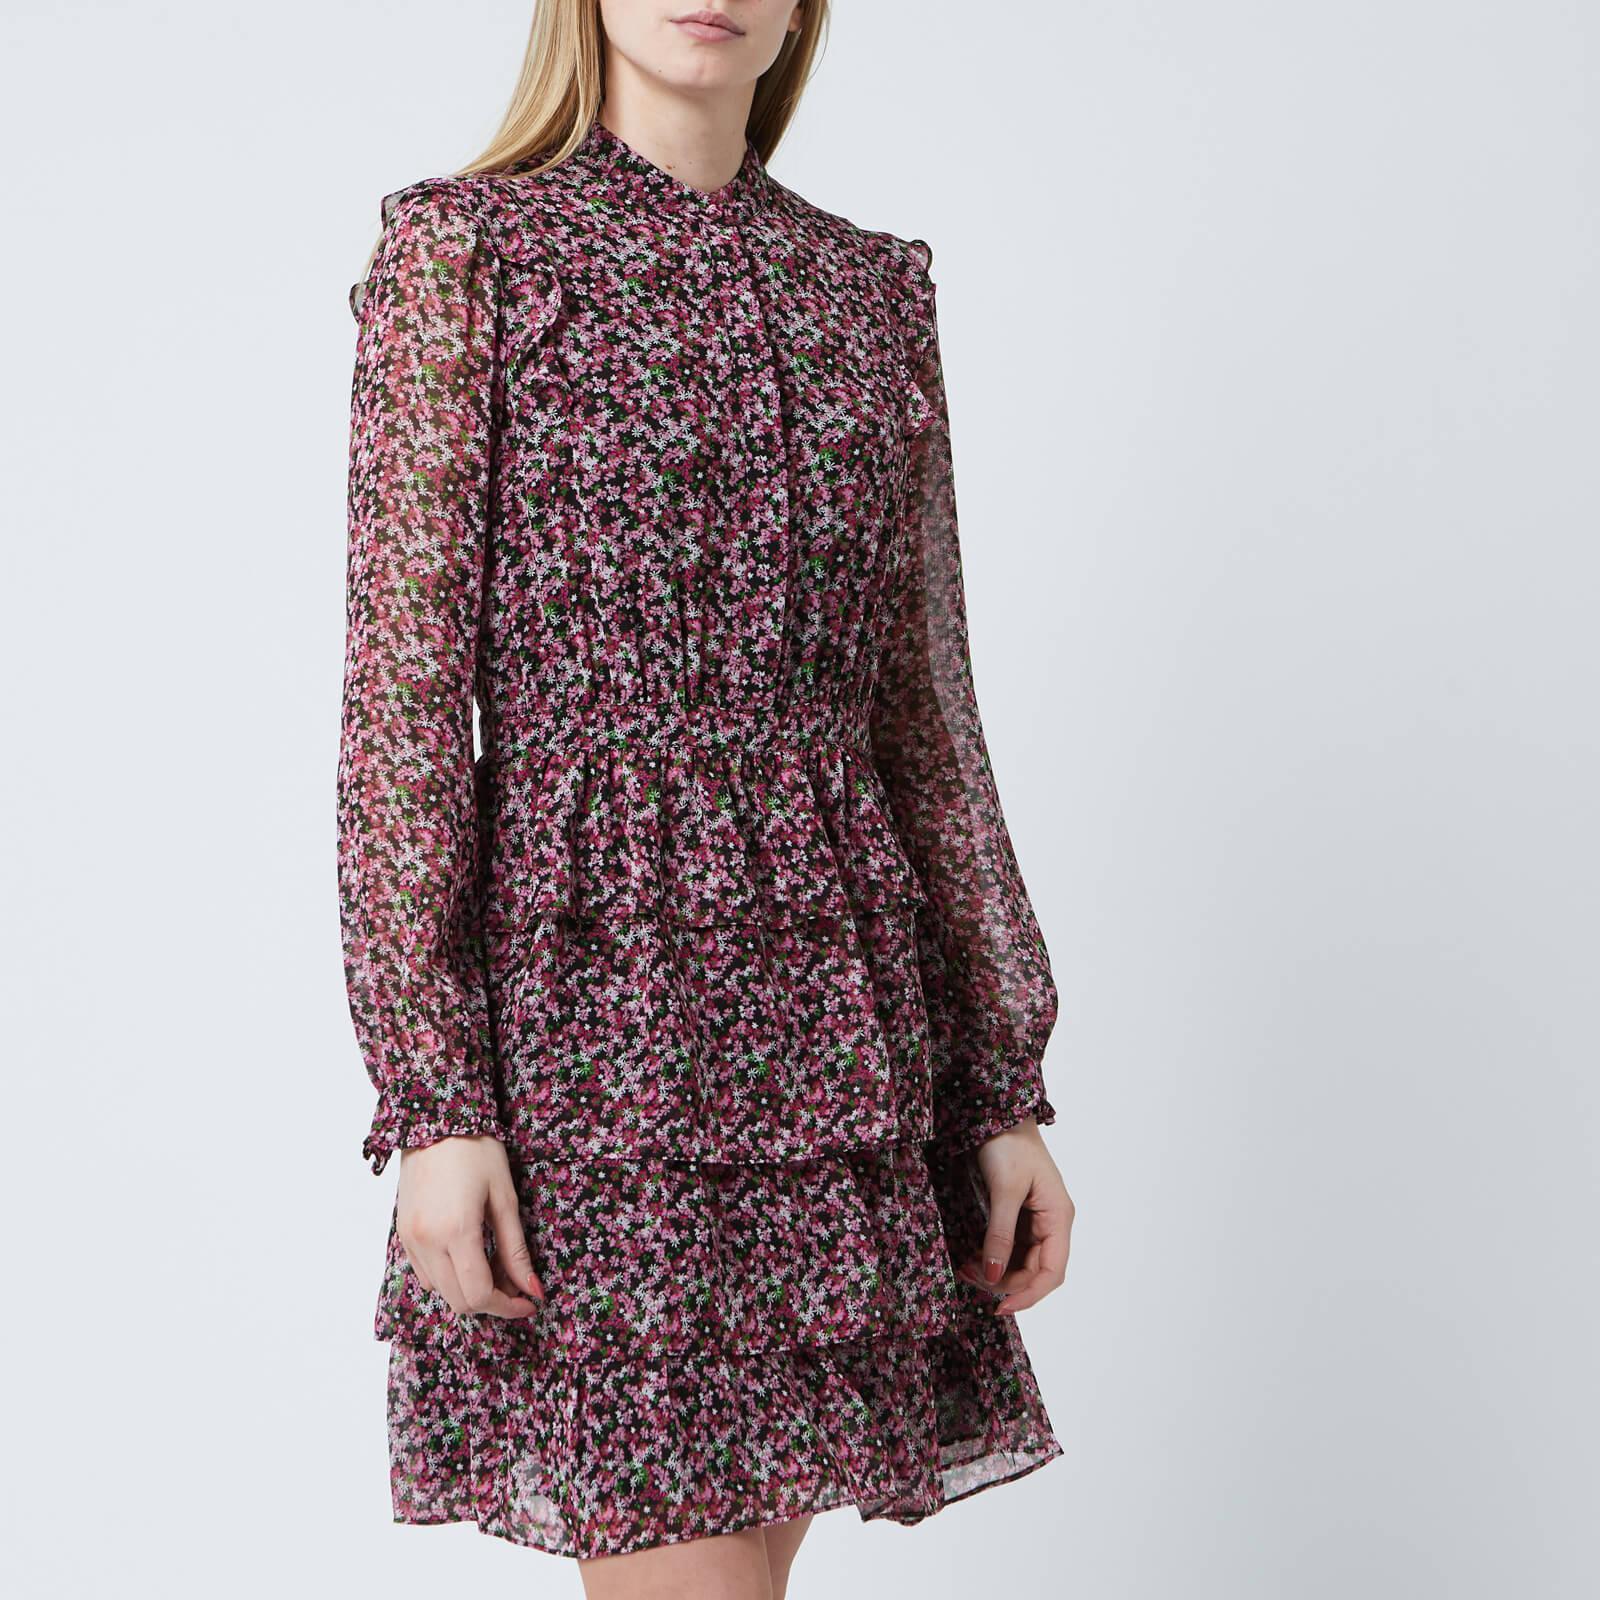 2a0bb475864 MICHAEL MICHAEL KORS Women's Floral Shirt Dress - Black/Electric Pink